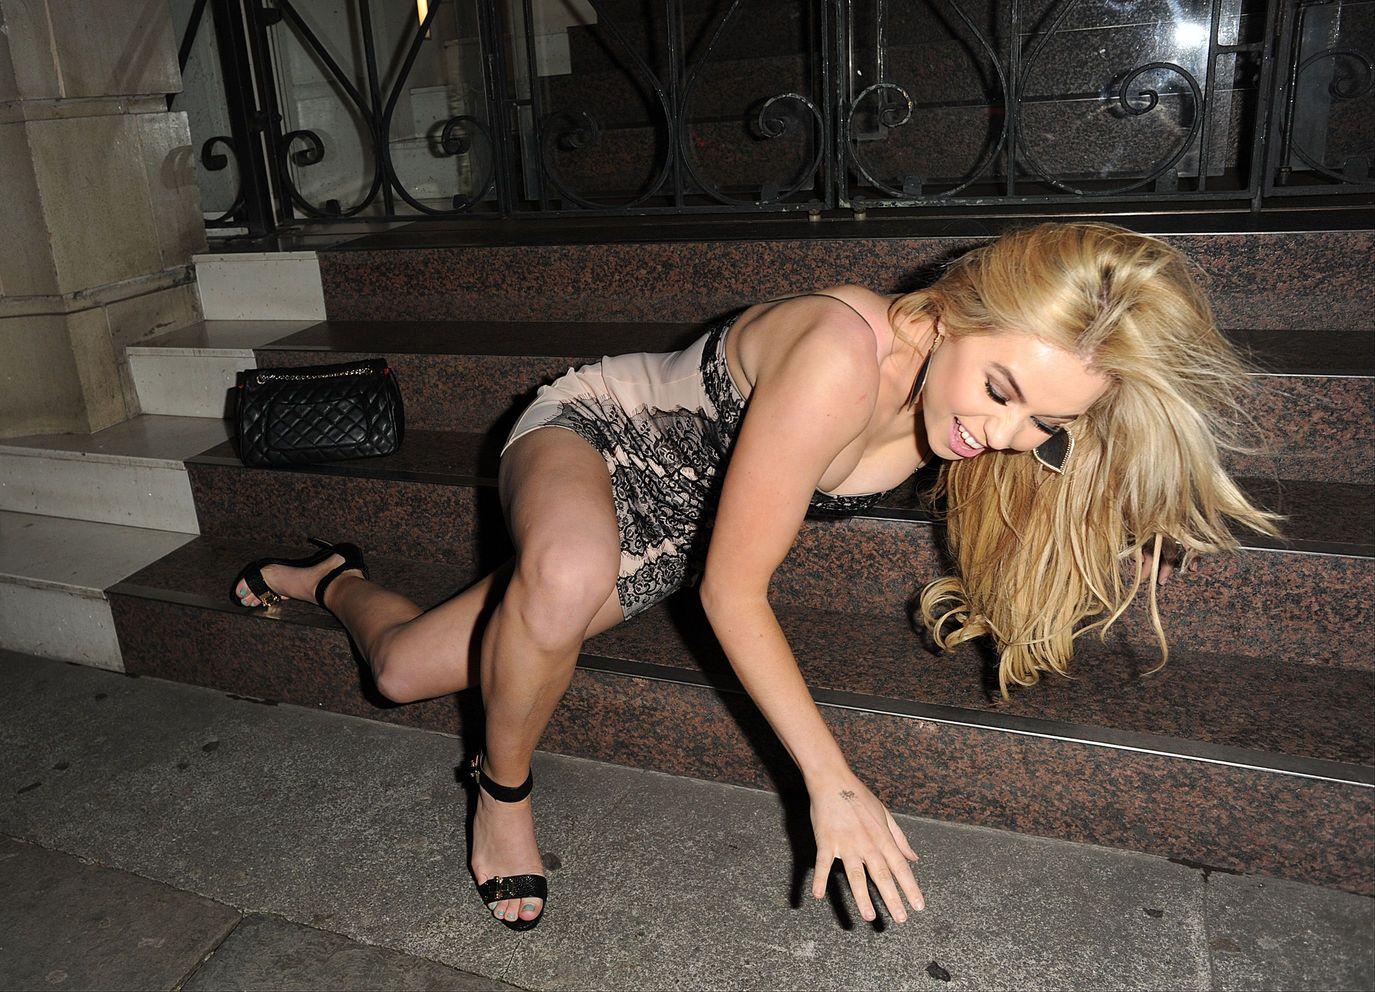 Melissa-Reeves-Nipple-Slip-Ass-8